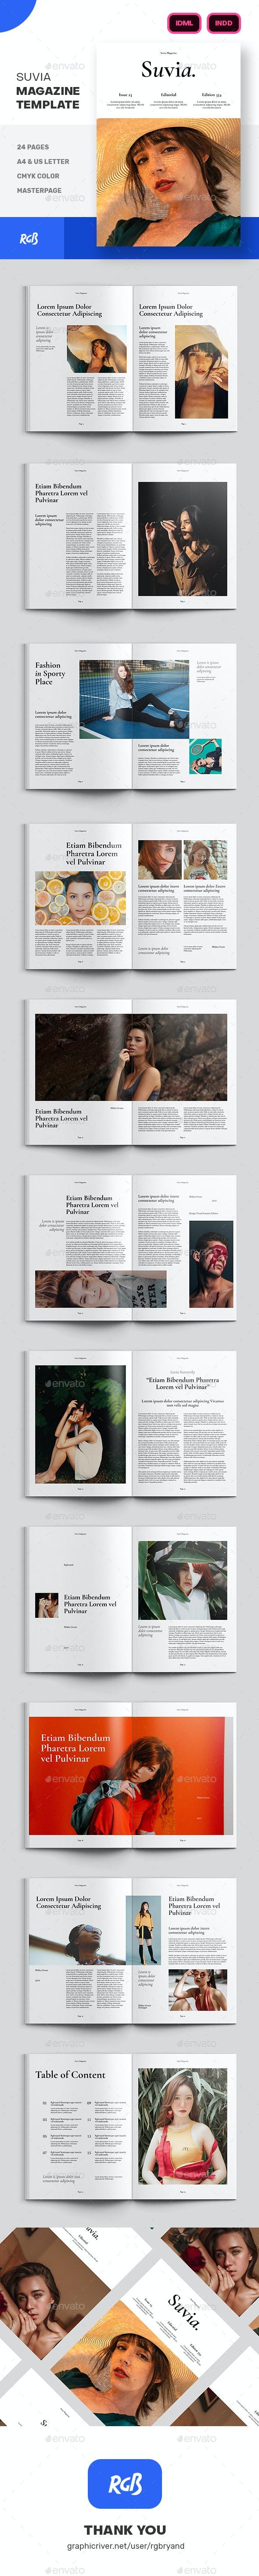 Suvia Fashion And Lifestyle Magazine Template - Magazines Print Templates